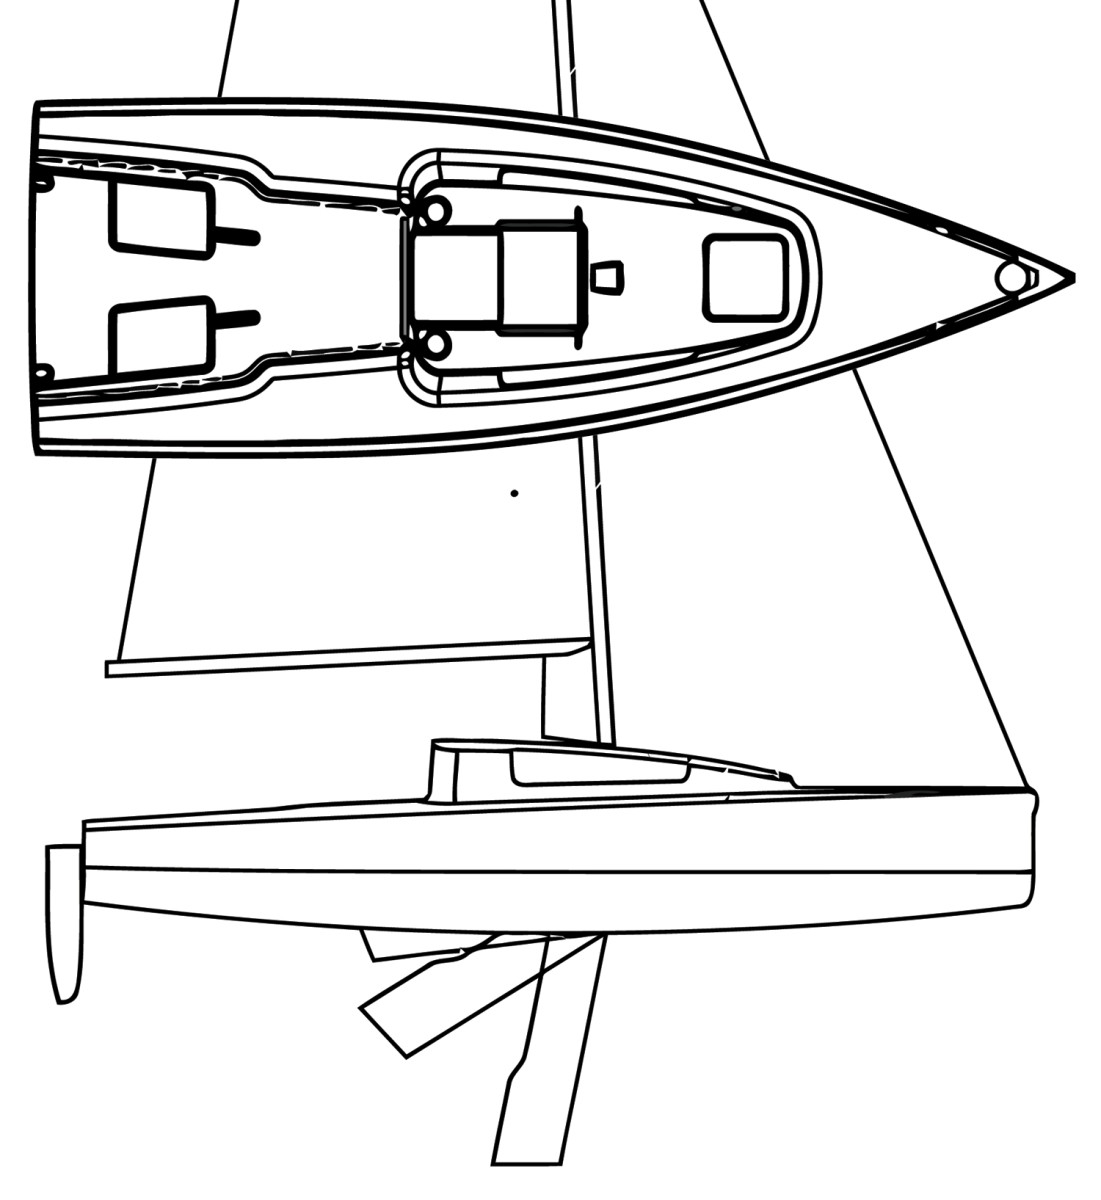 24-side-draw